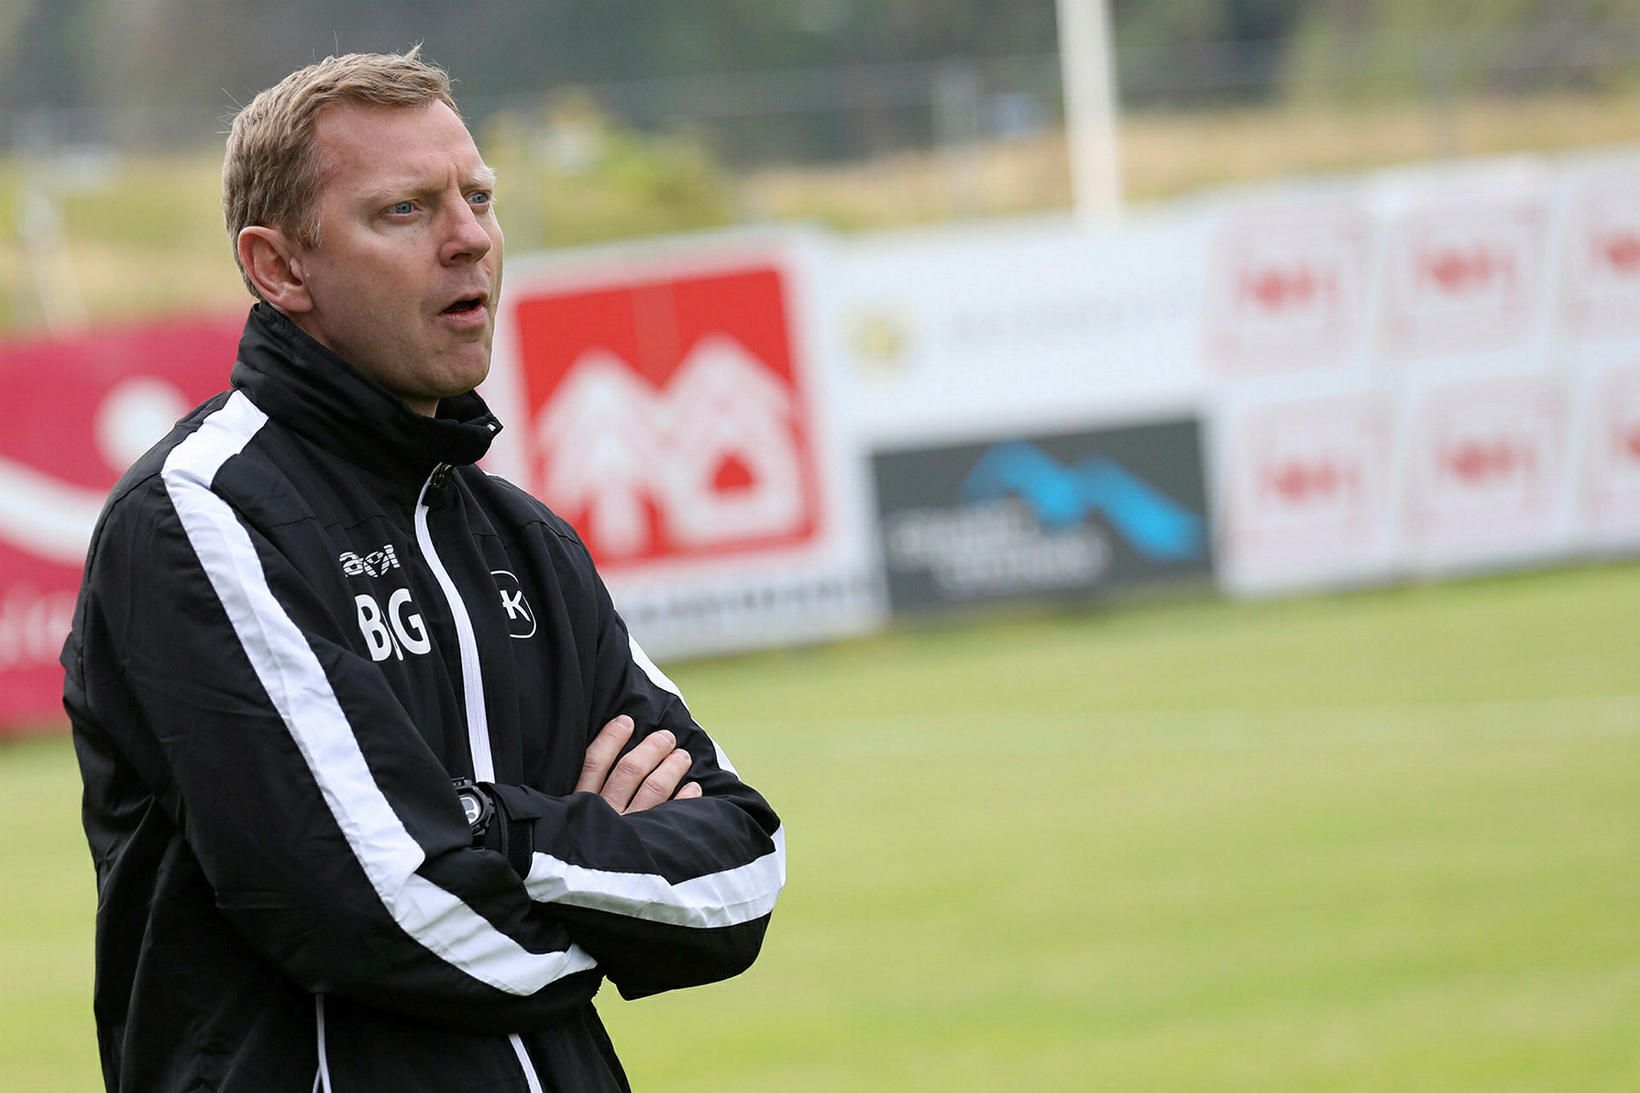 Brynjar Björn Gunnarsson